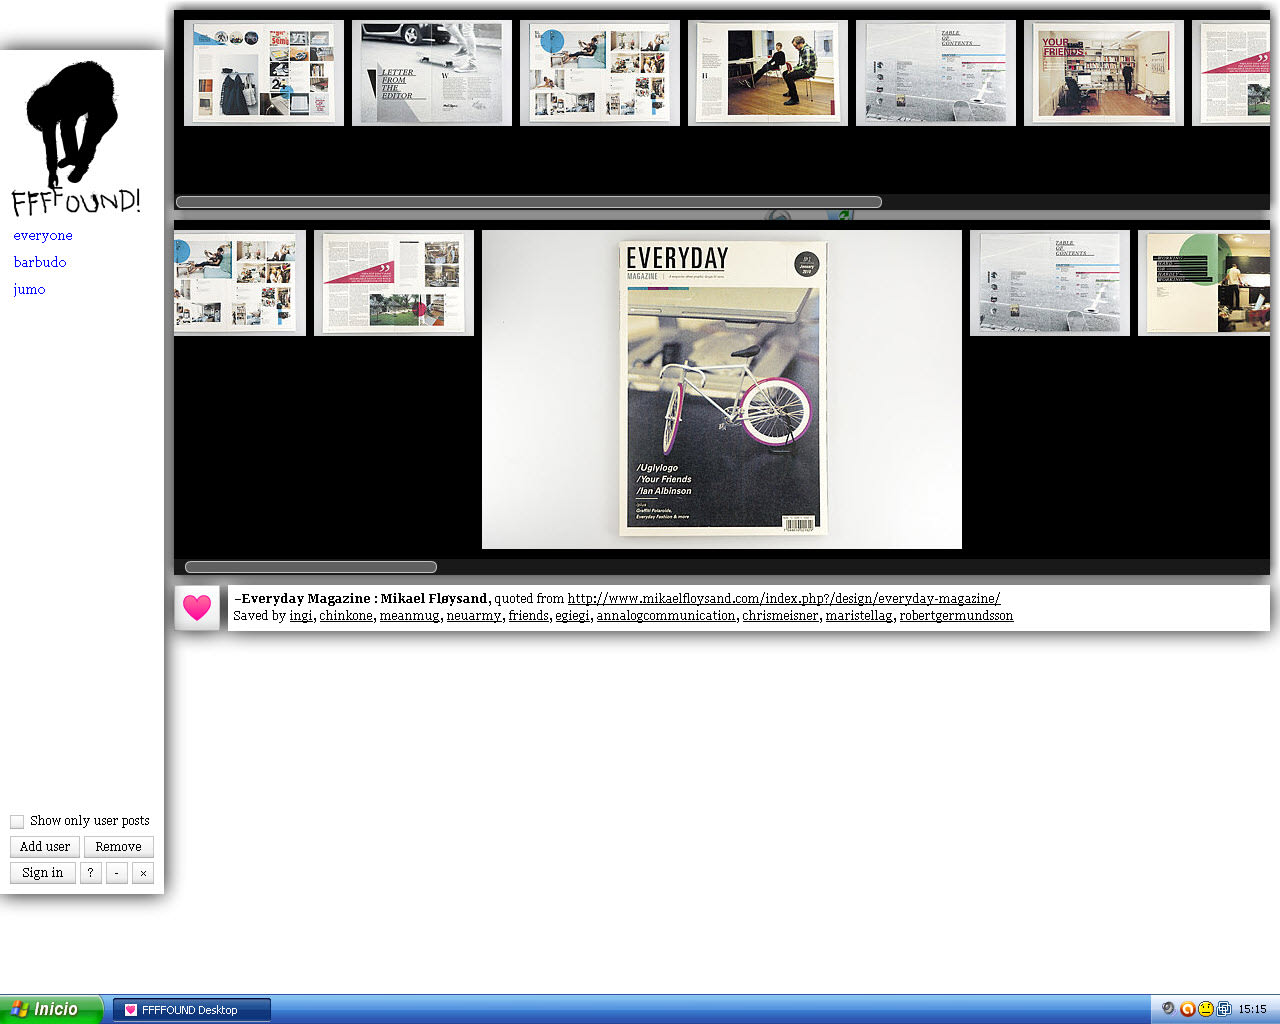 Ffffound Desktop